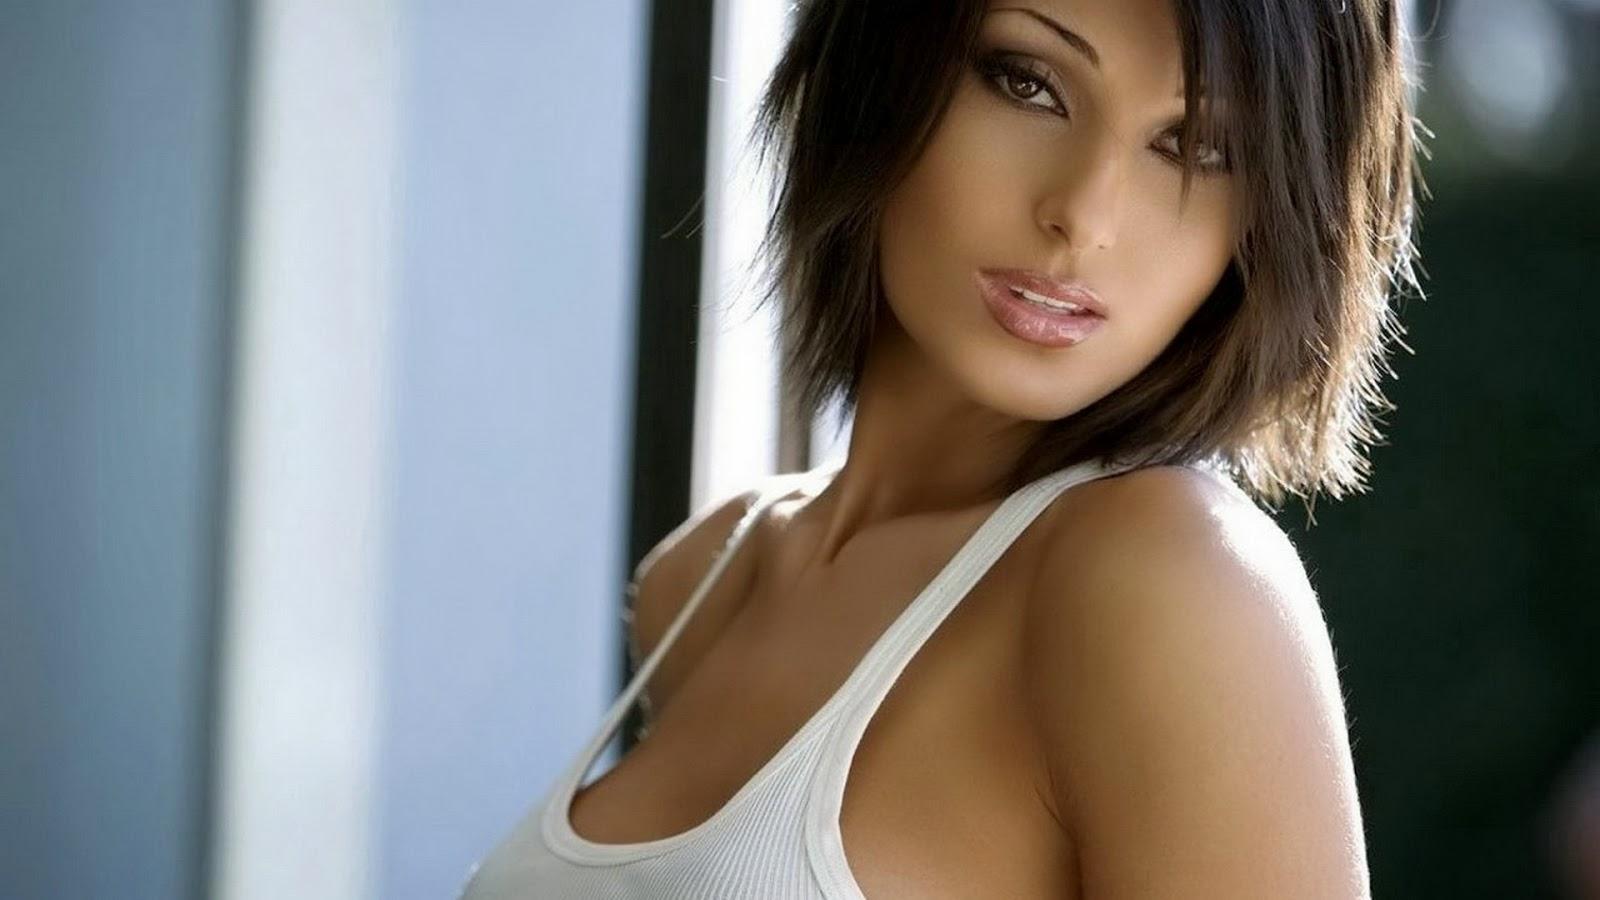 Claudia lynx nude